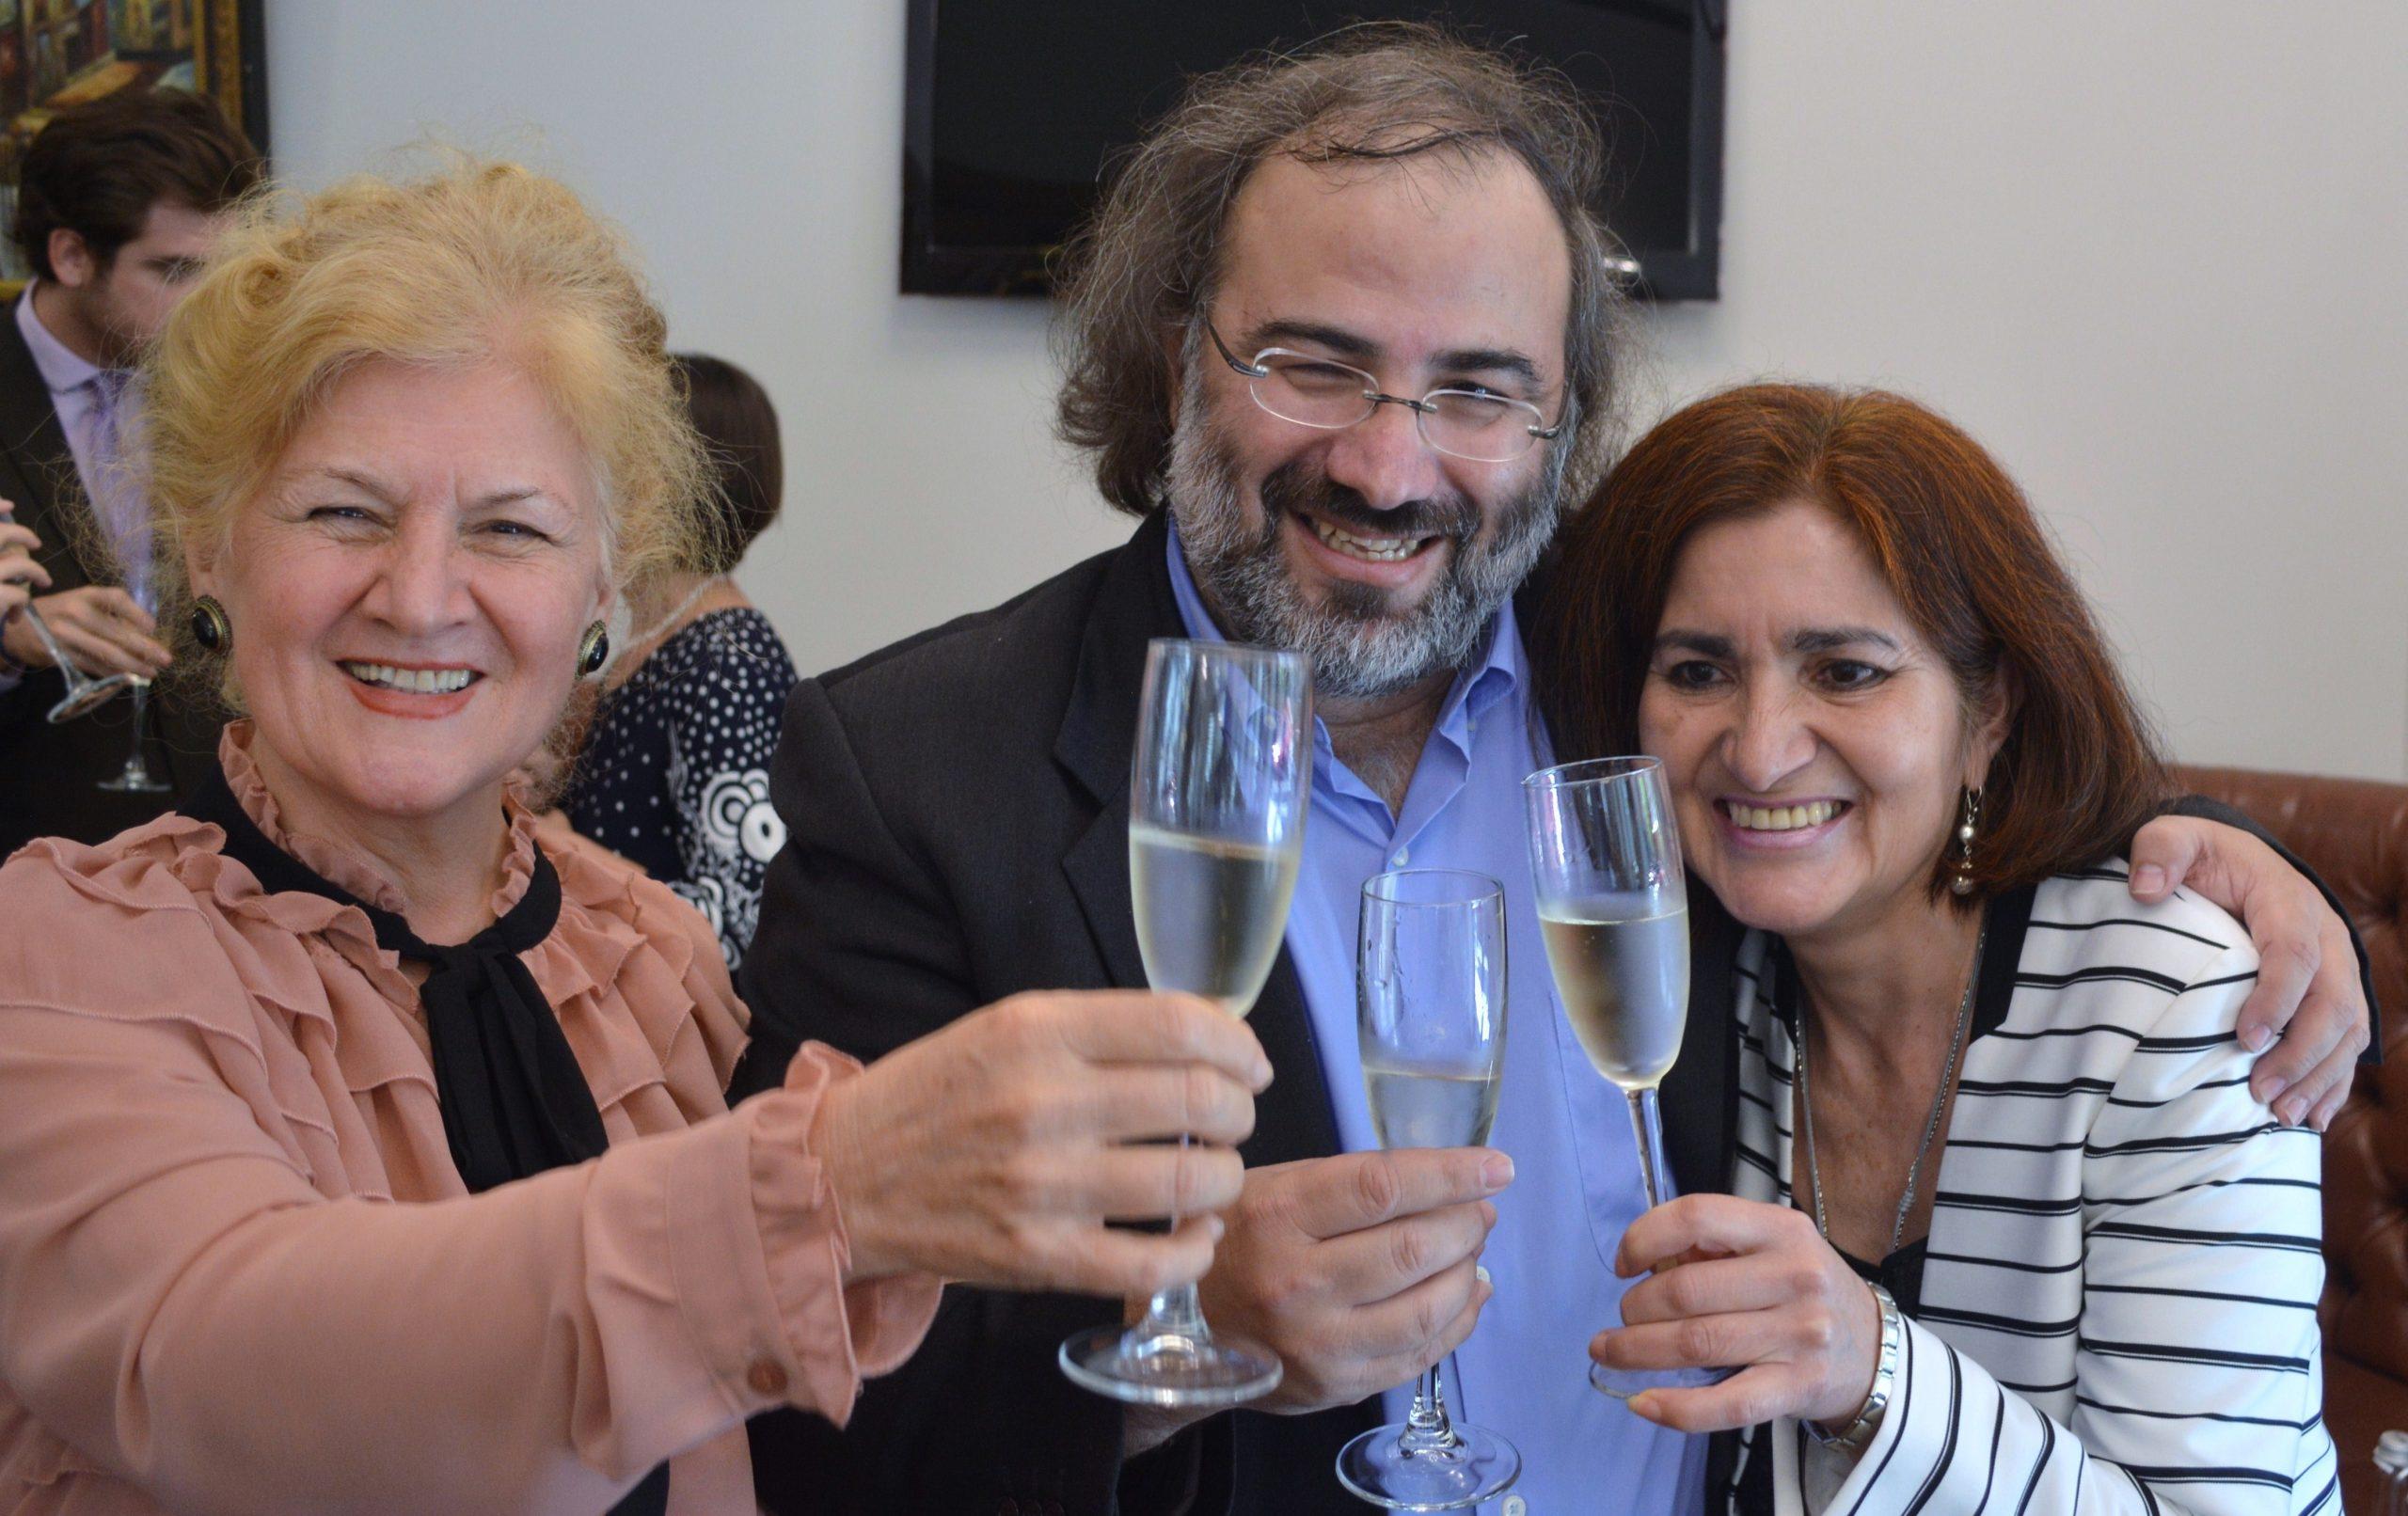 'Muchas gracias / Mulțumesc mult'. Homenaje rumano a Jacqueline Alencar